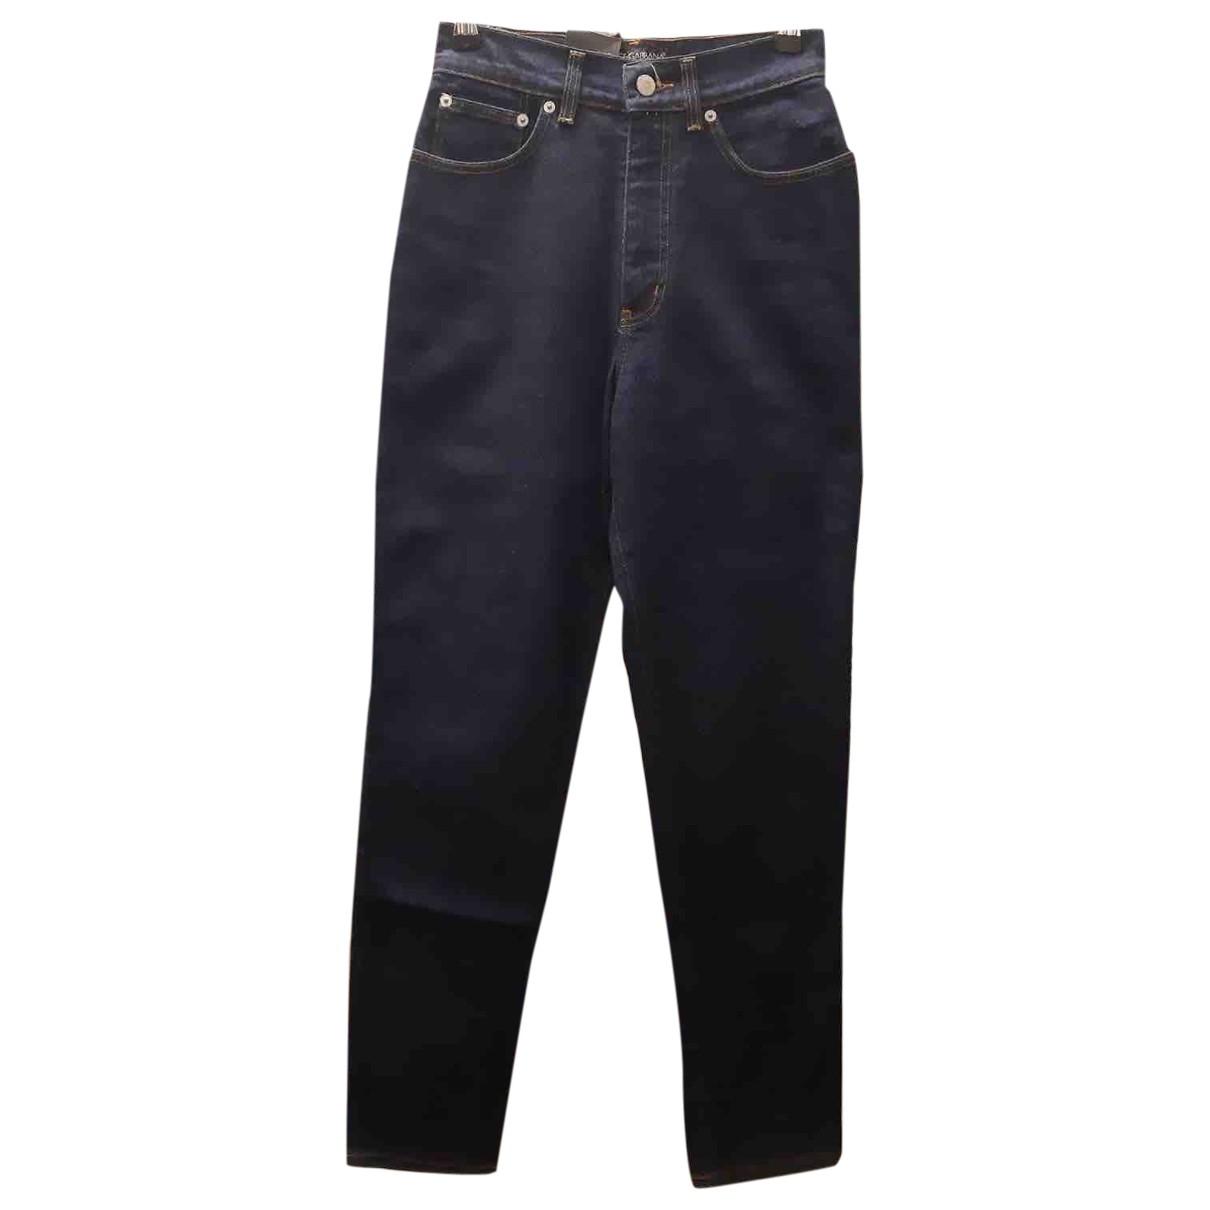 Dolce & Gabbana \N Blue Denim - Jeans Trousers for Women 10 US